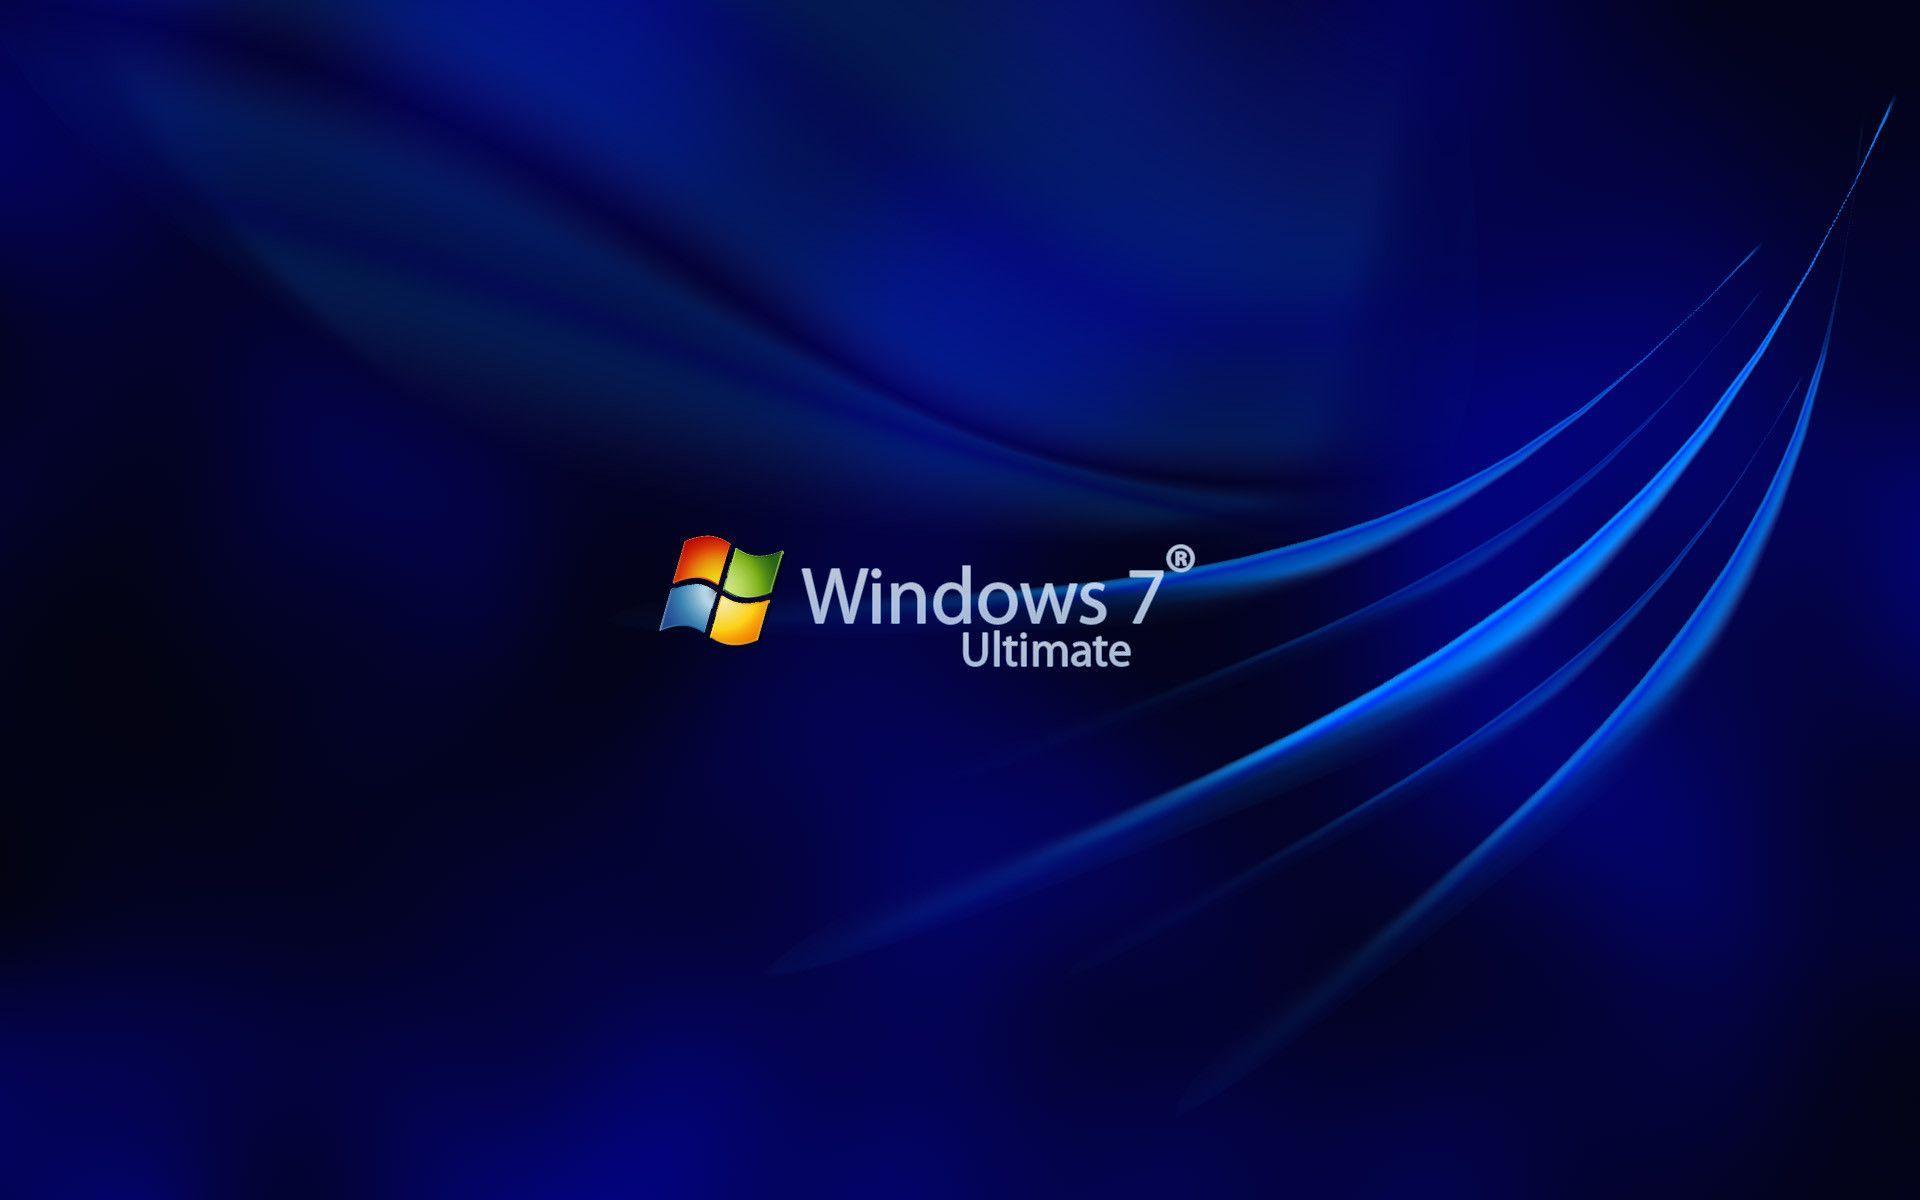 Windows 7 Professional Desktop Wallpapers Top Free Windows 7